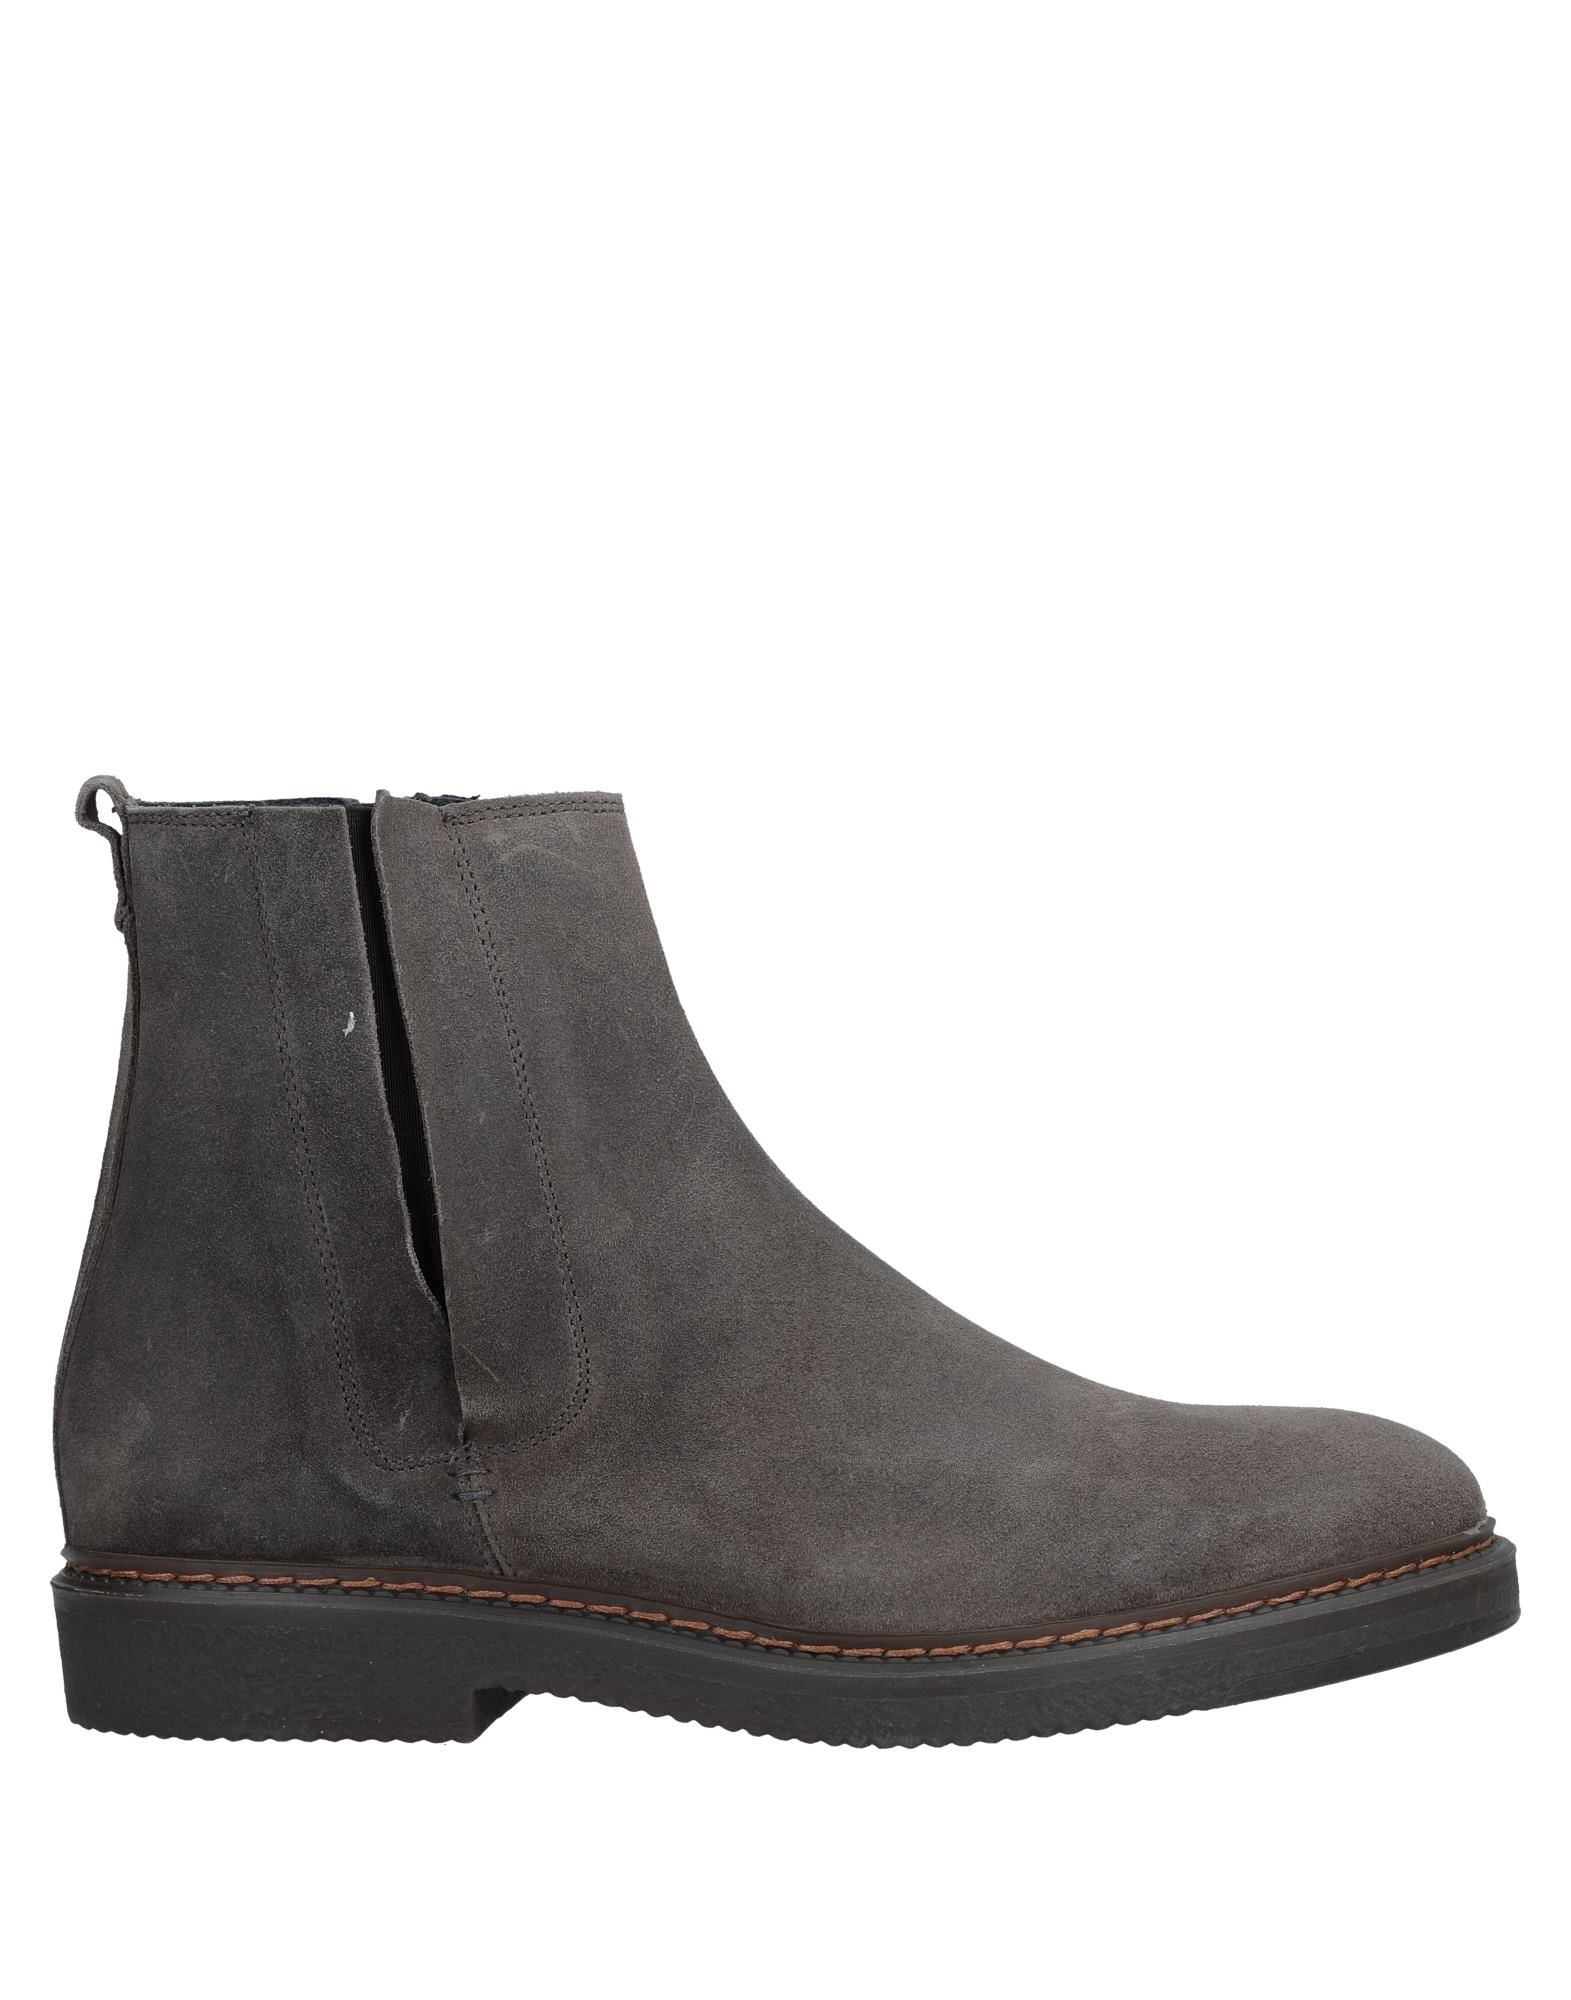 Rabatt echte Schuhe Florsheim Stiefelette Herren  11529345NC